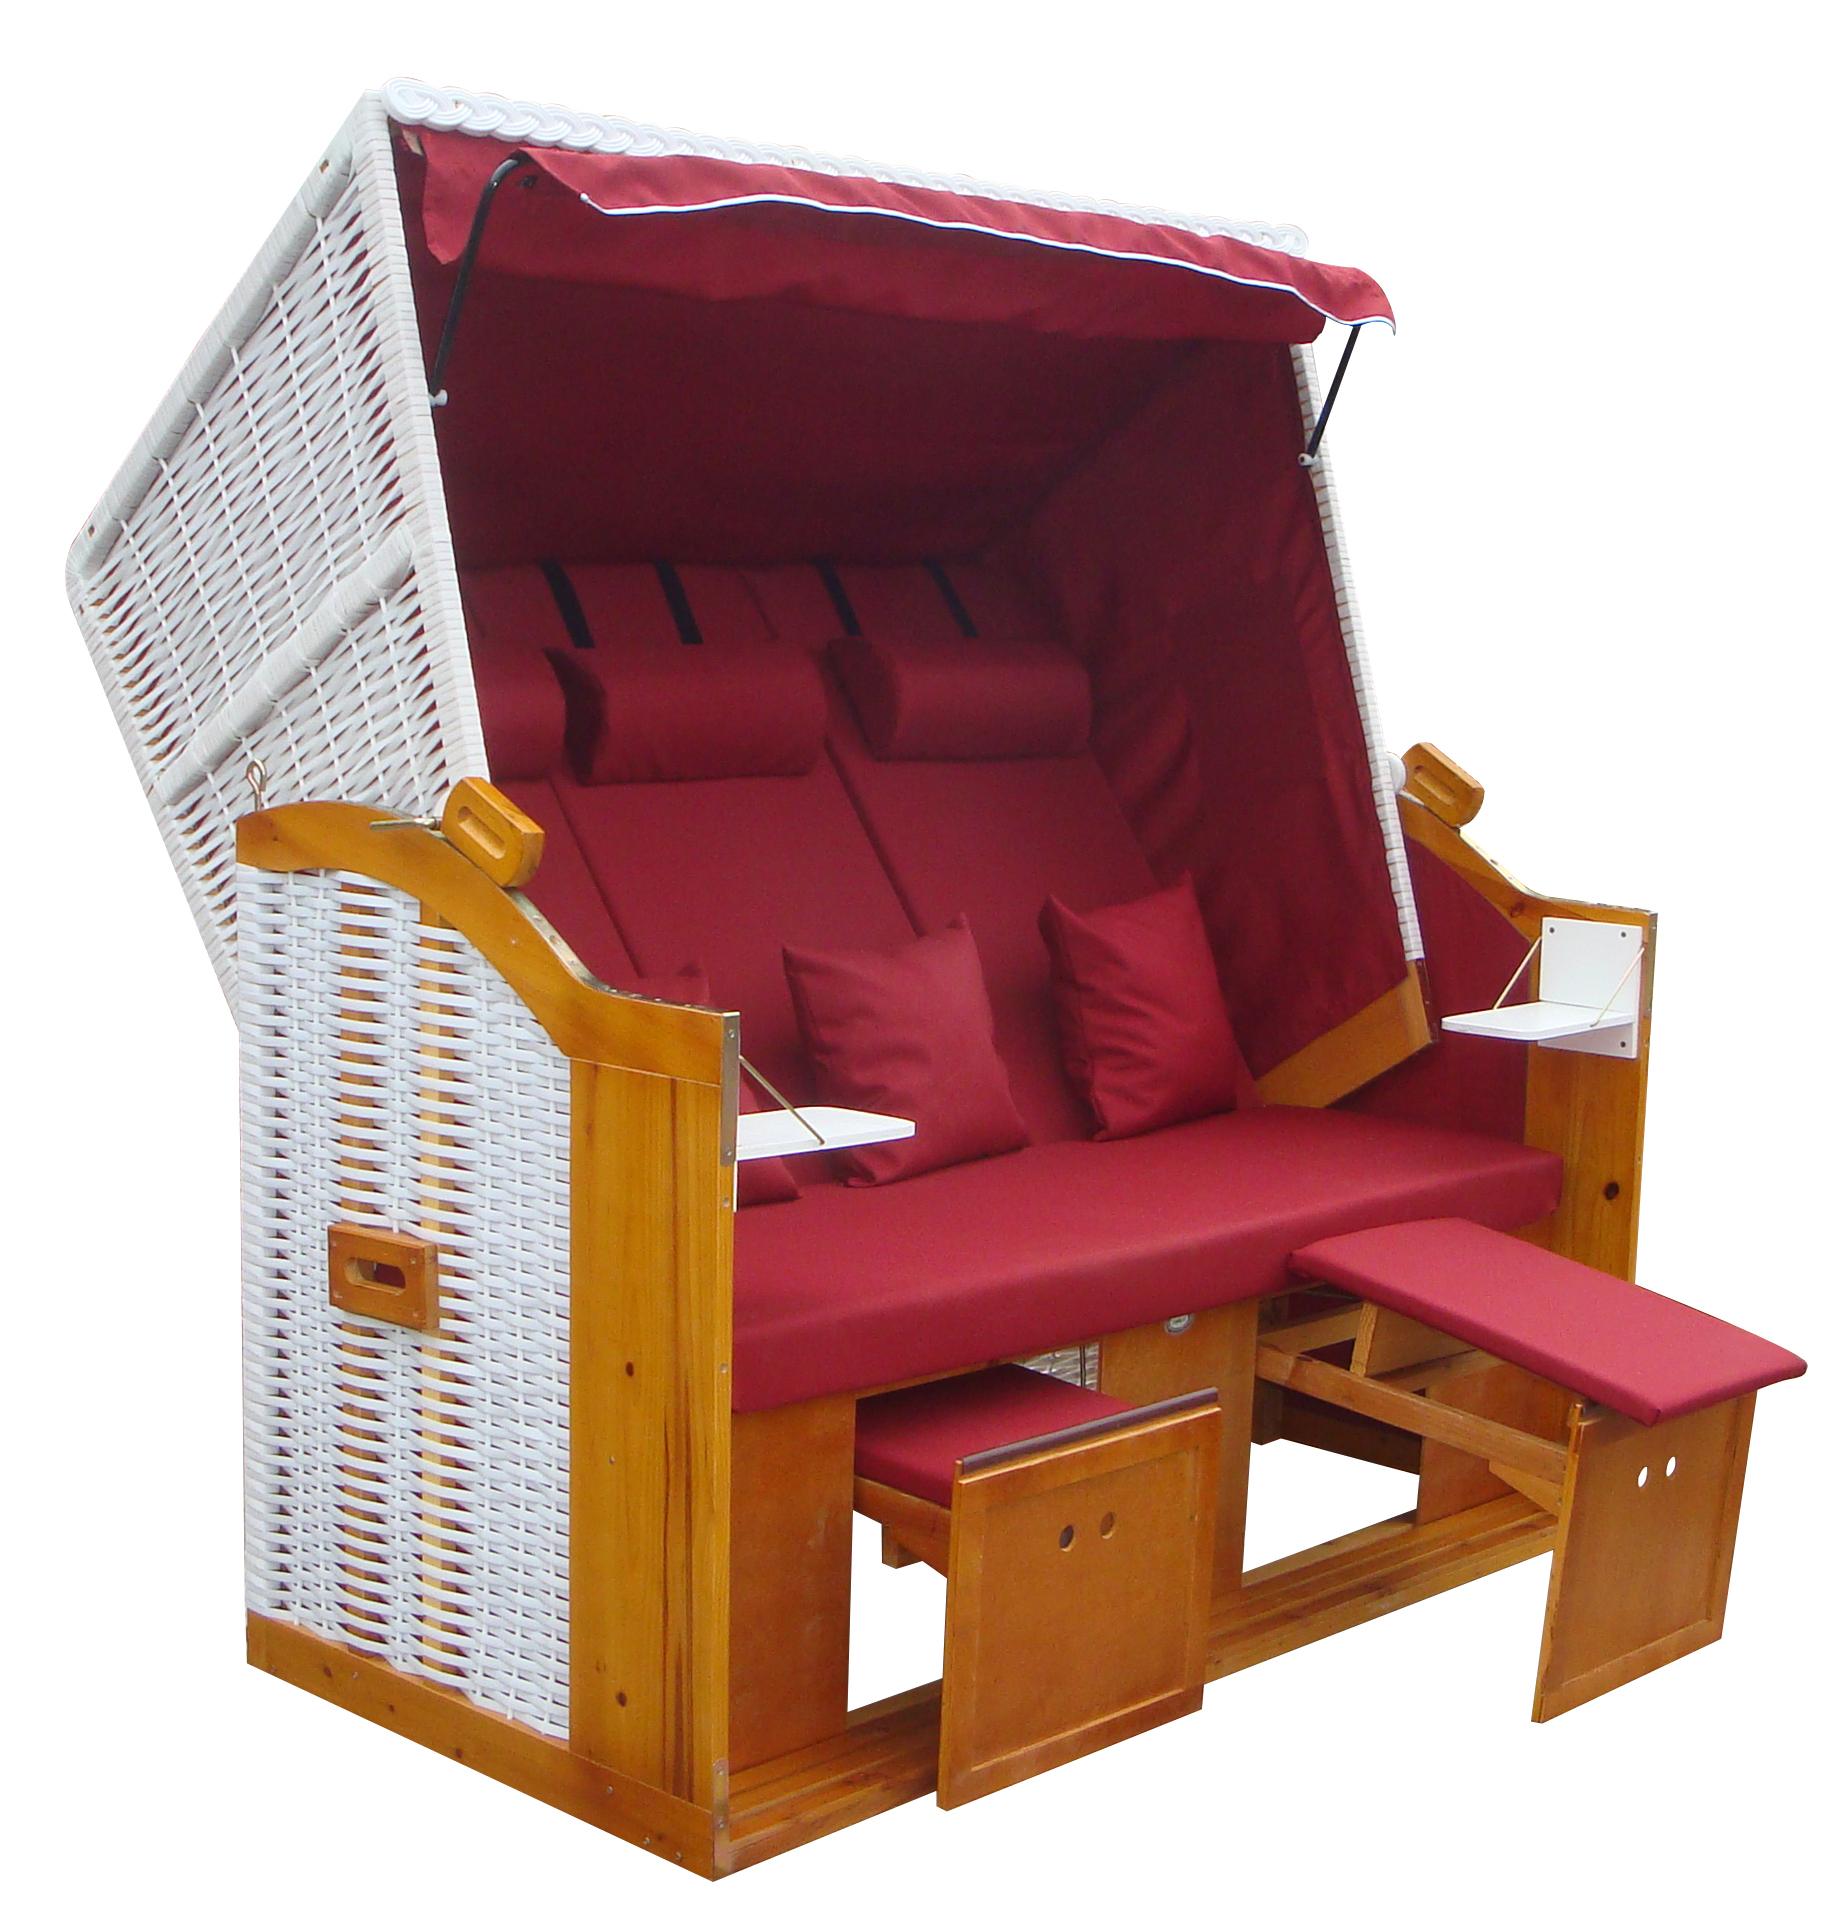 strandkorb ostsee de luxe trio xxl rot wbu 155cm breit 3 sitzer ebay. Black Bedroom Furniture Sets. Home Design Ideas